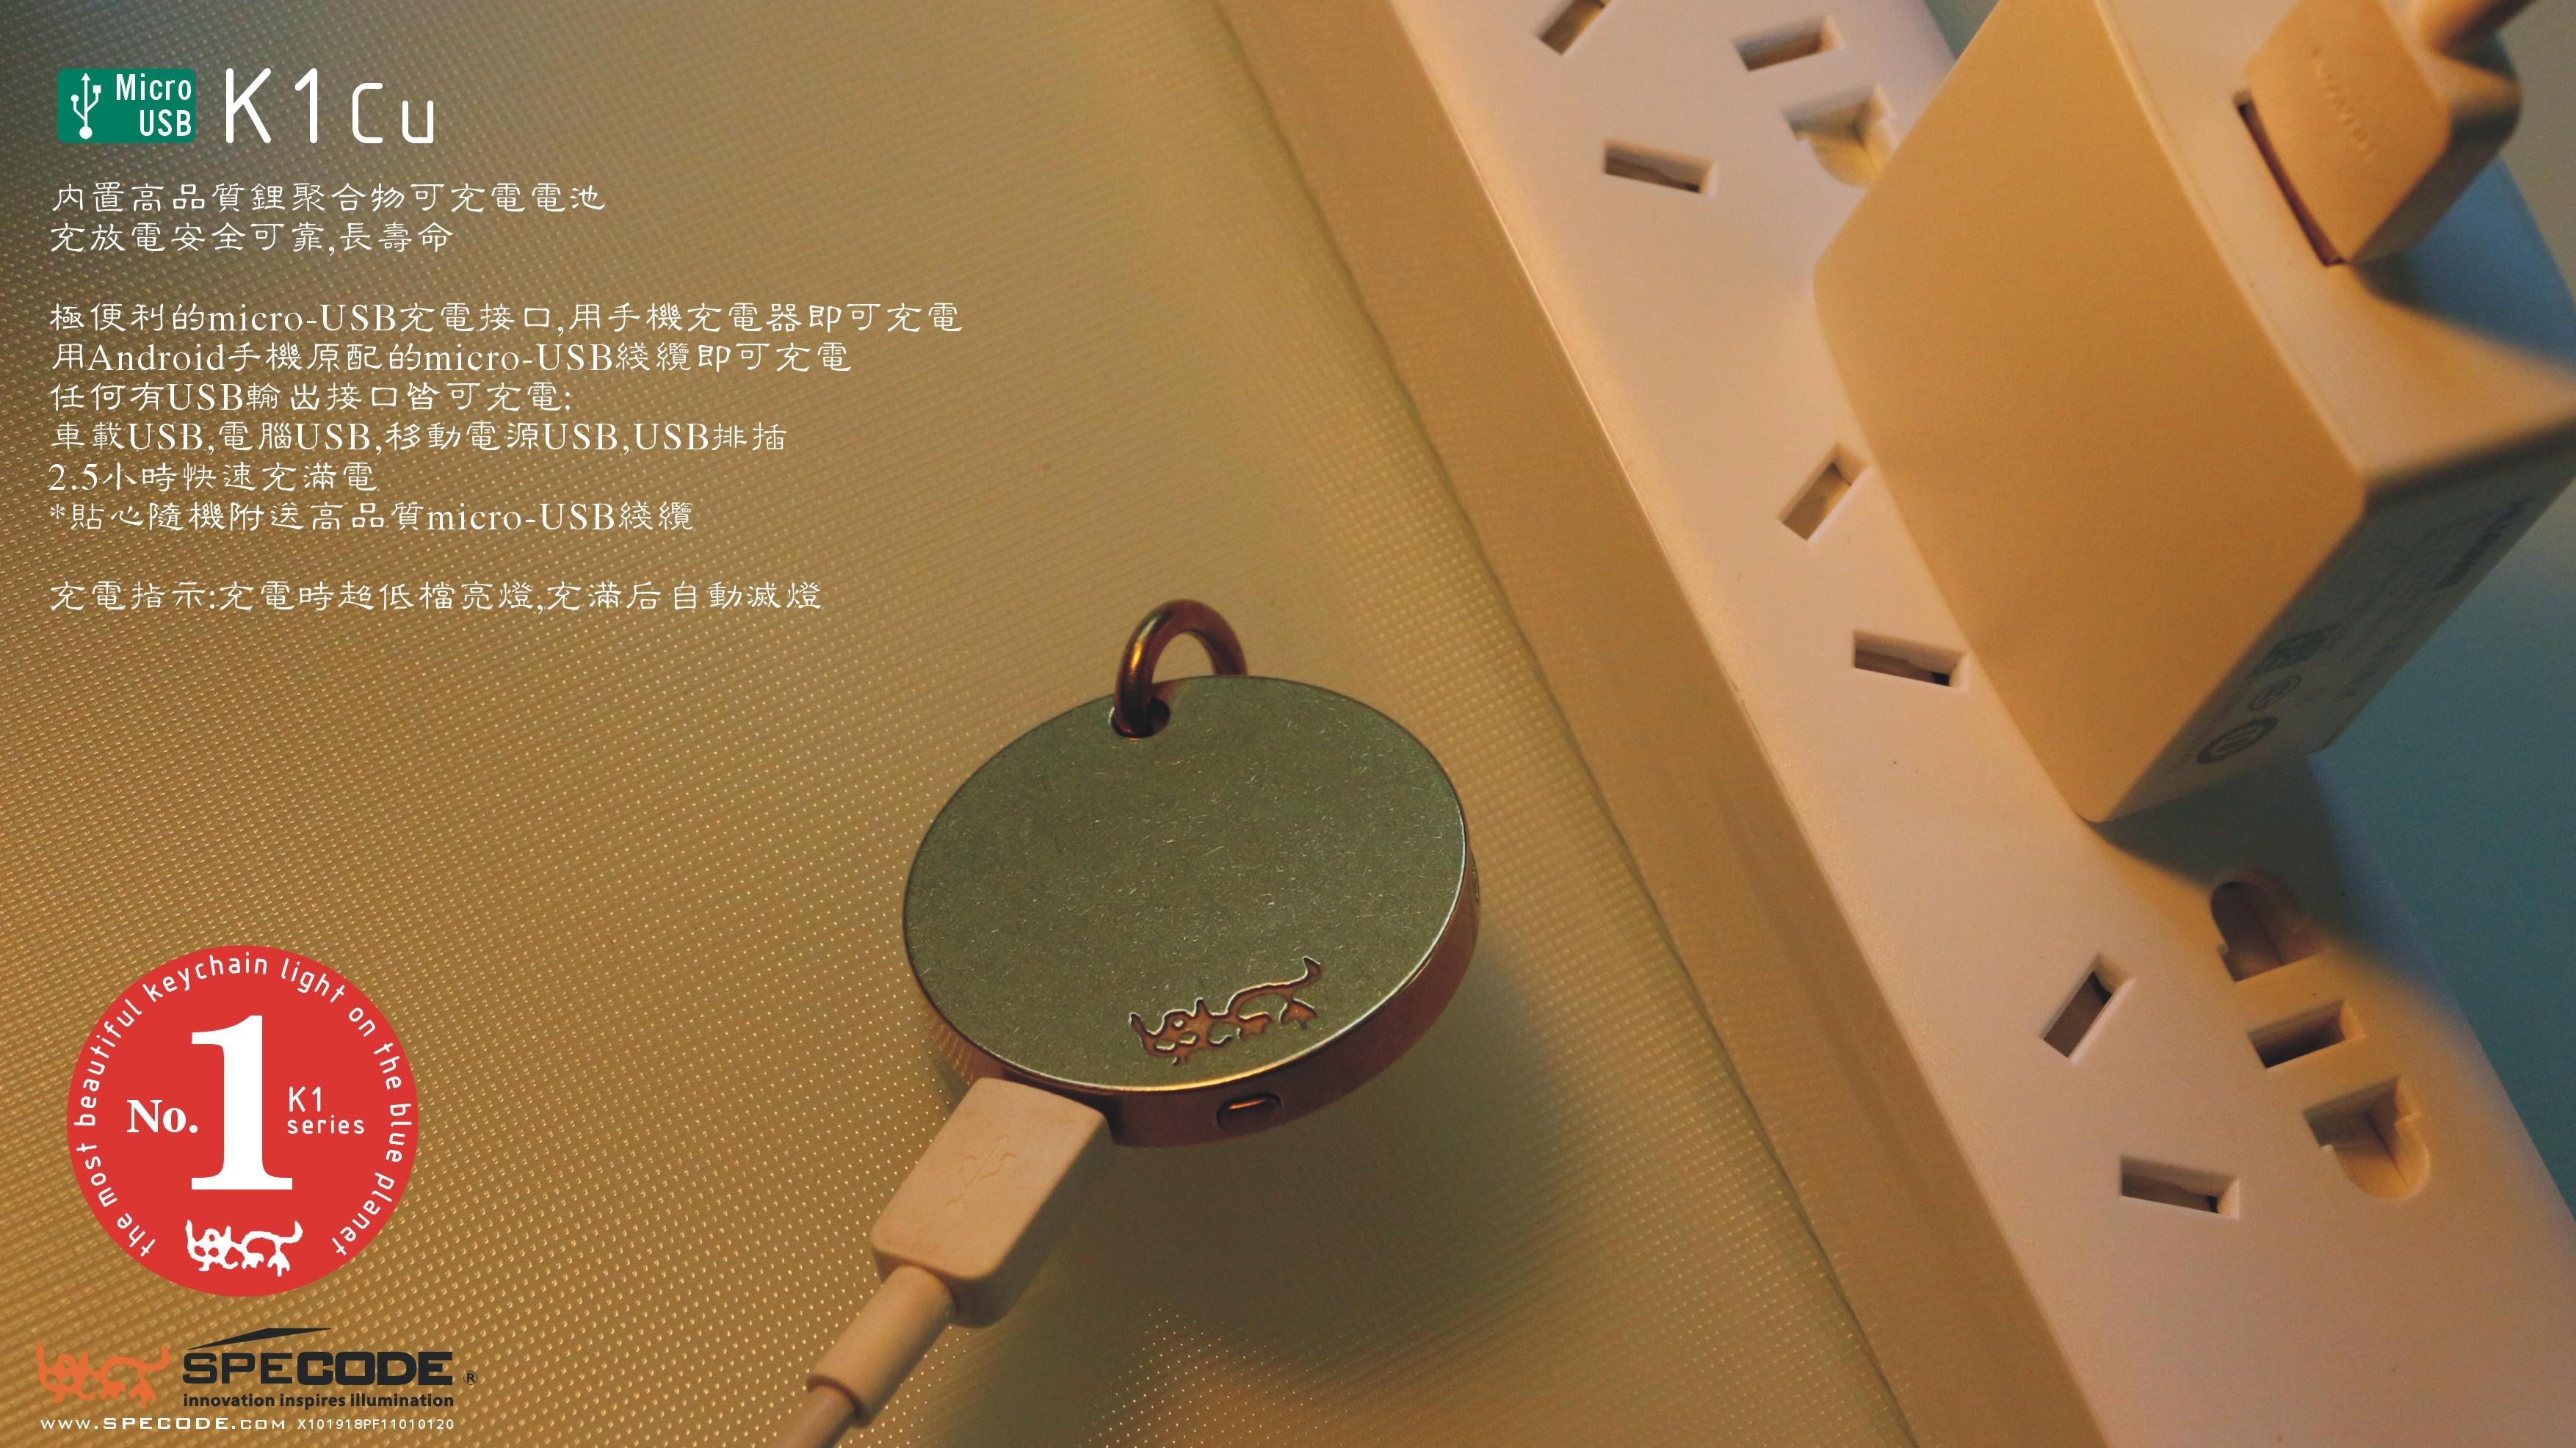 21181022SPECODEK1Cu-microUSBcharging充电